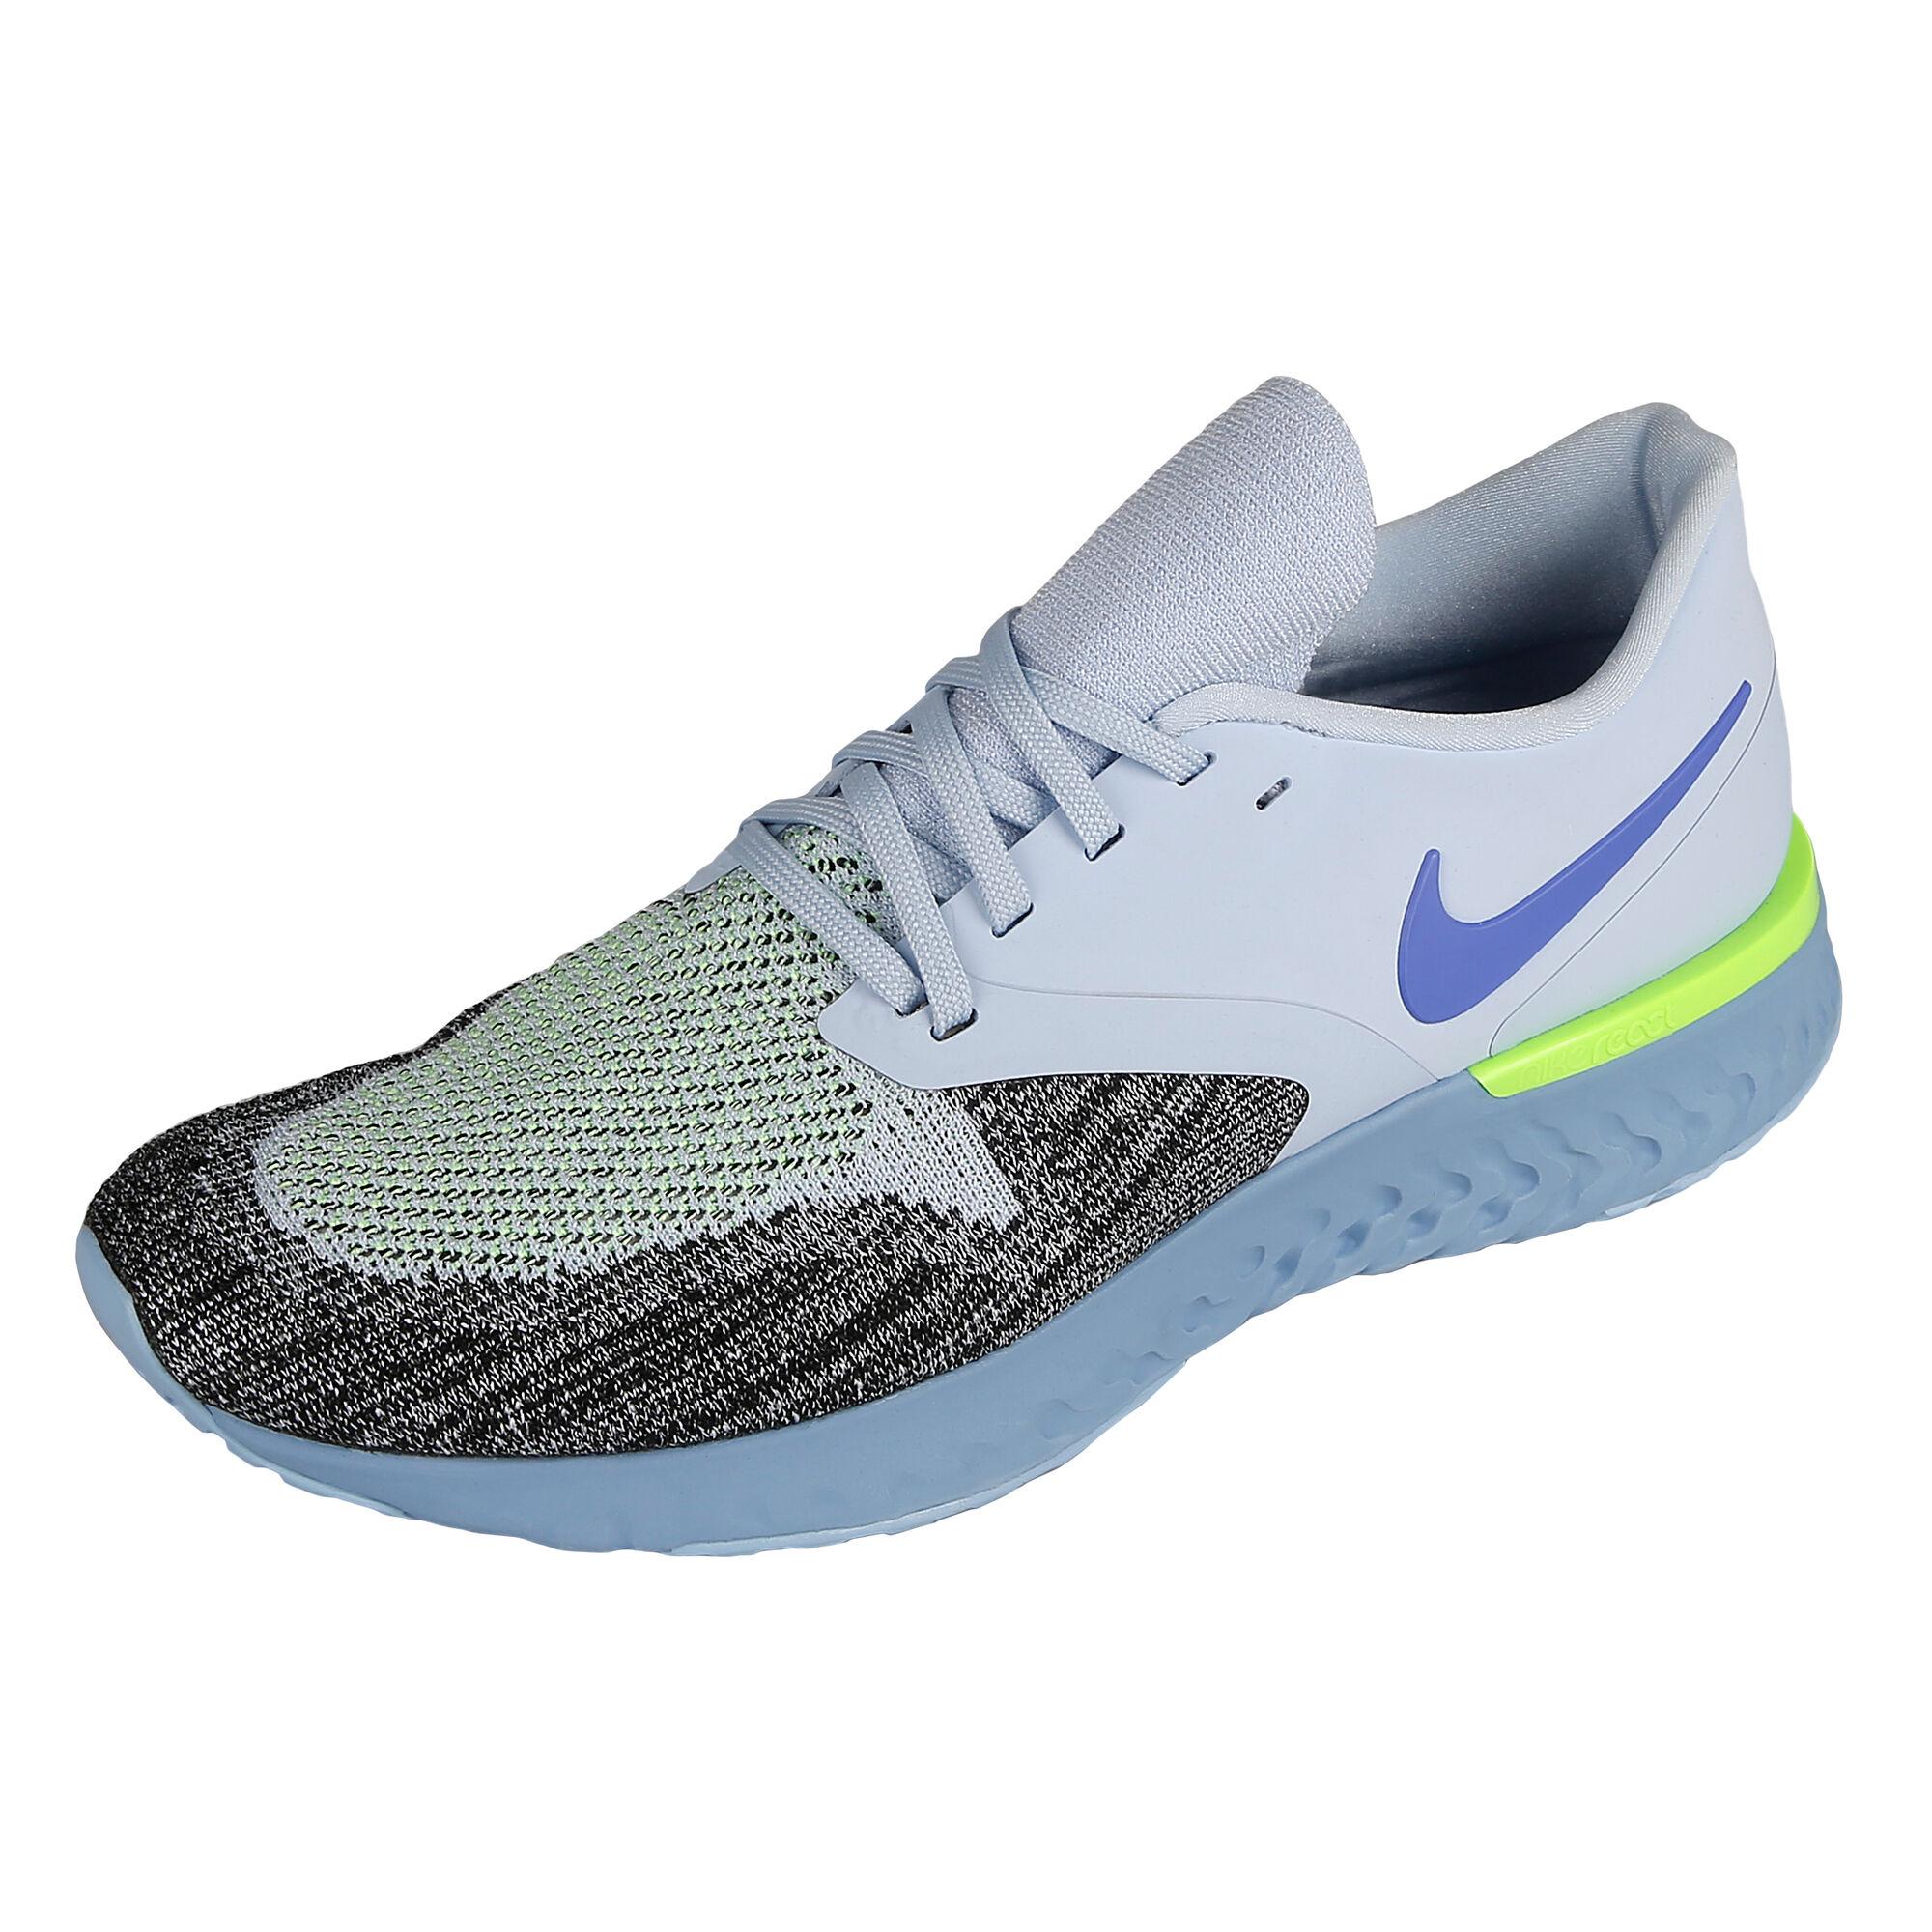 3043c950a7237c Nike Odyssey React Flyknit 2 Neutralschuh Herren - Grau